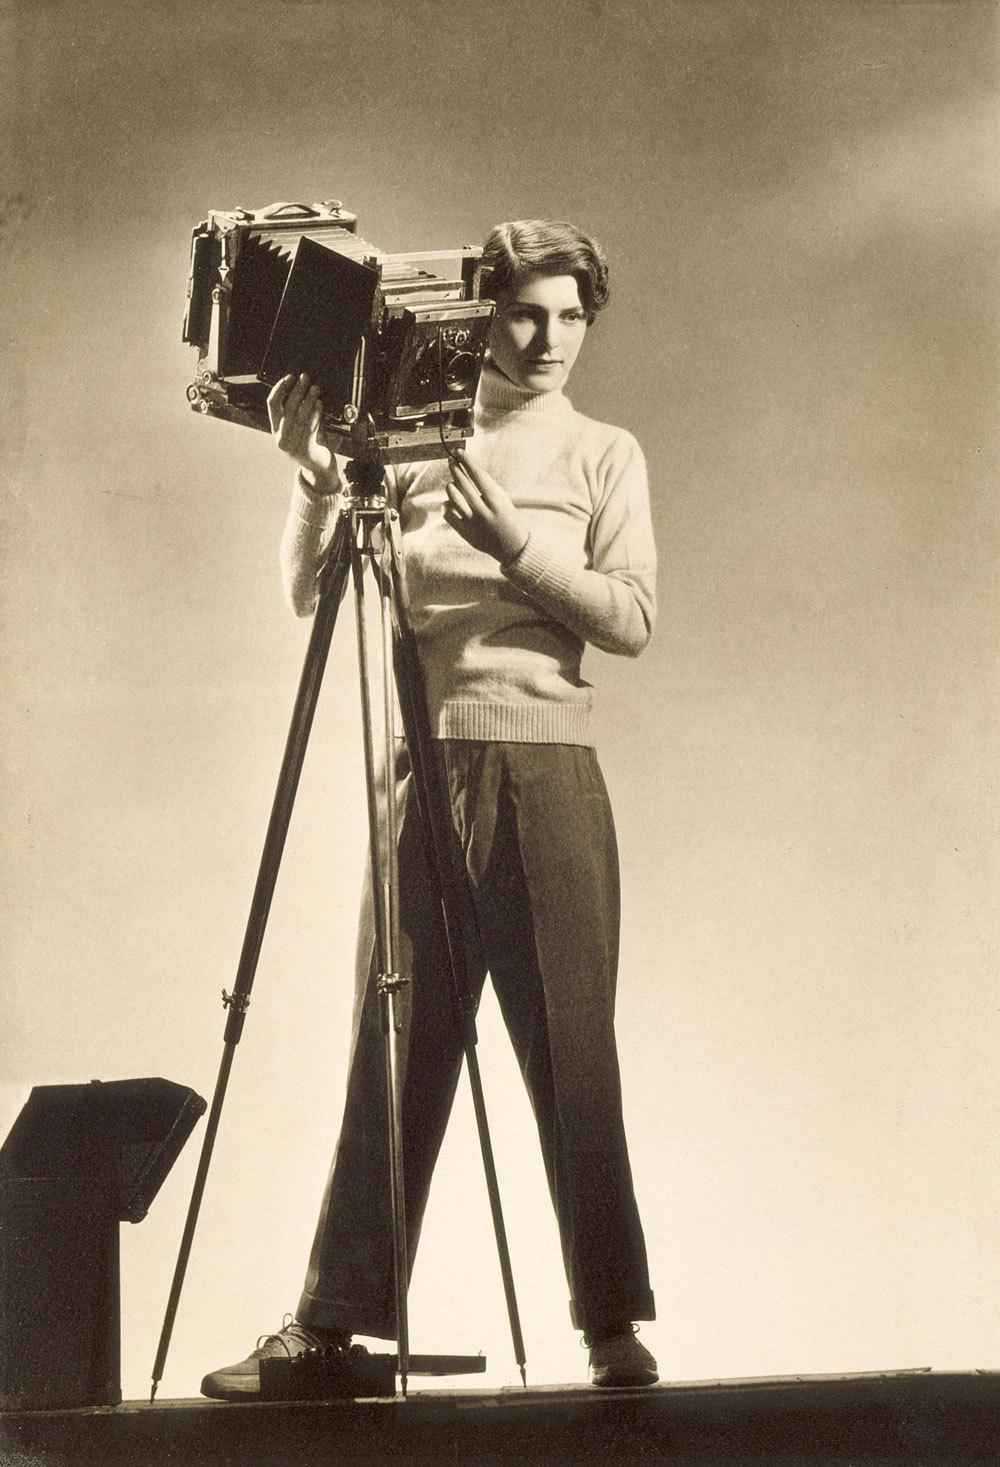 Chi ha paura delle fotografe?